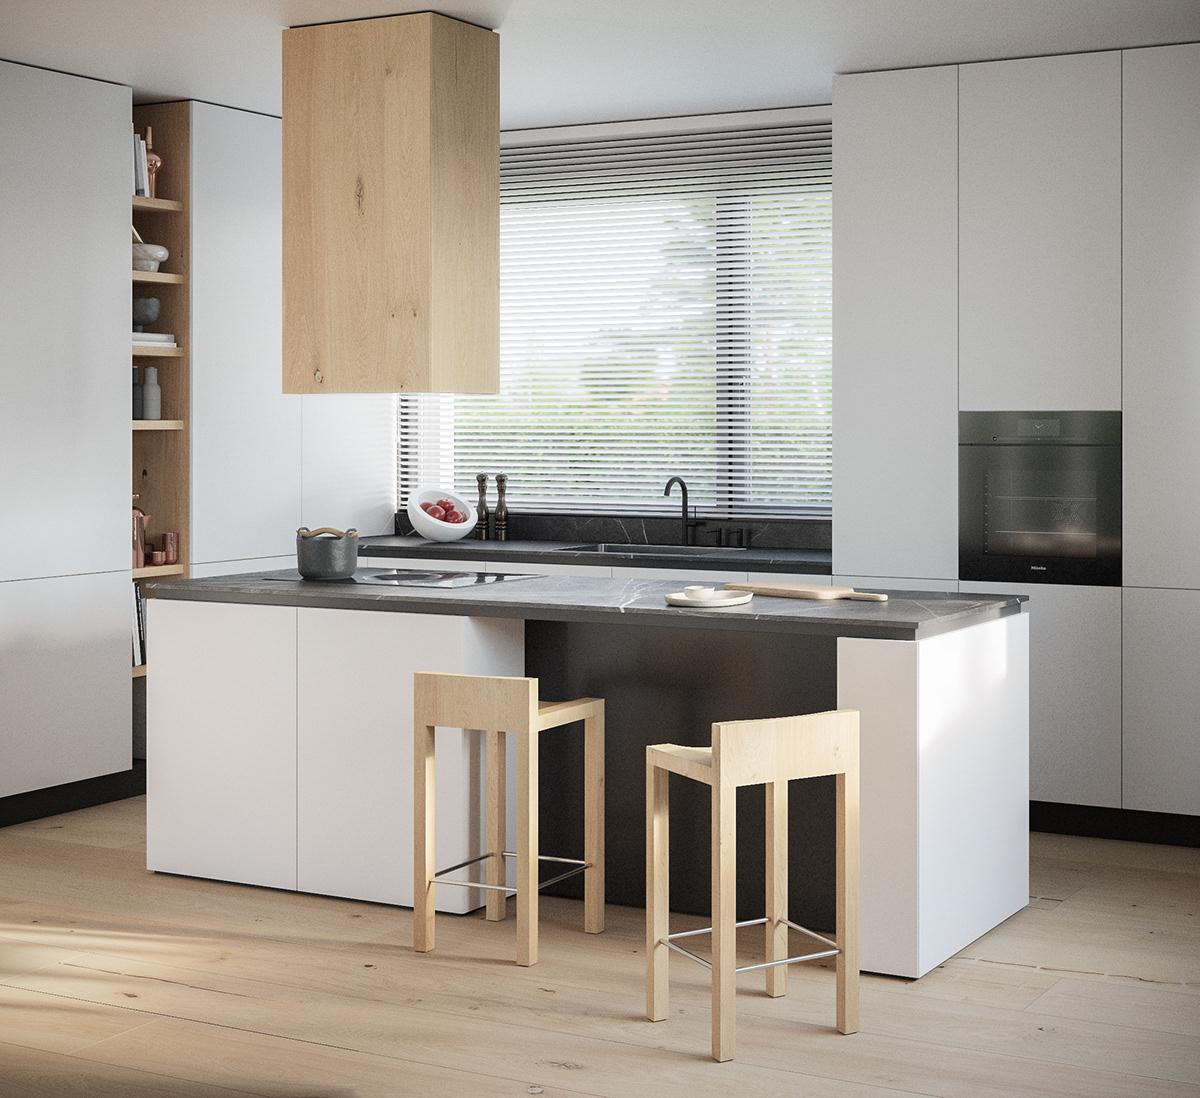 3D 3dmodel architecture archviz art CGI design digital photography  interior design  Render